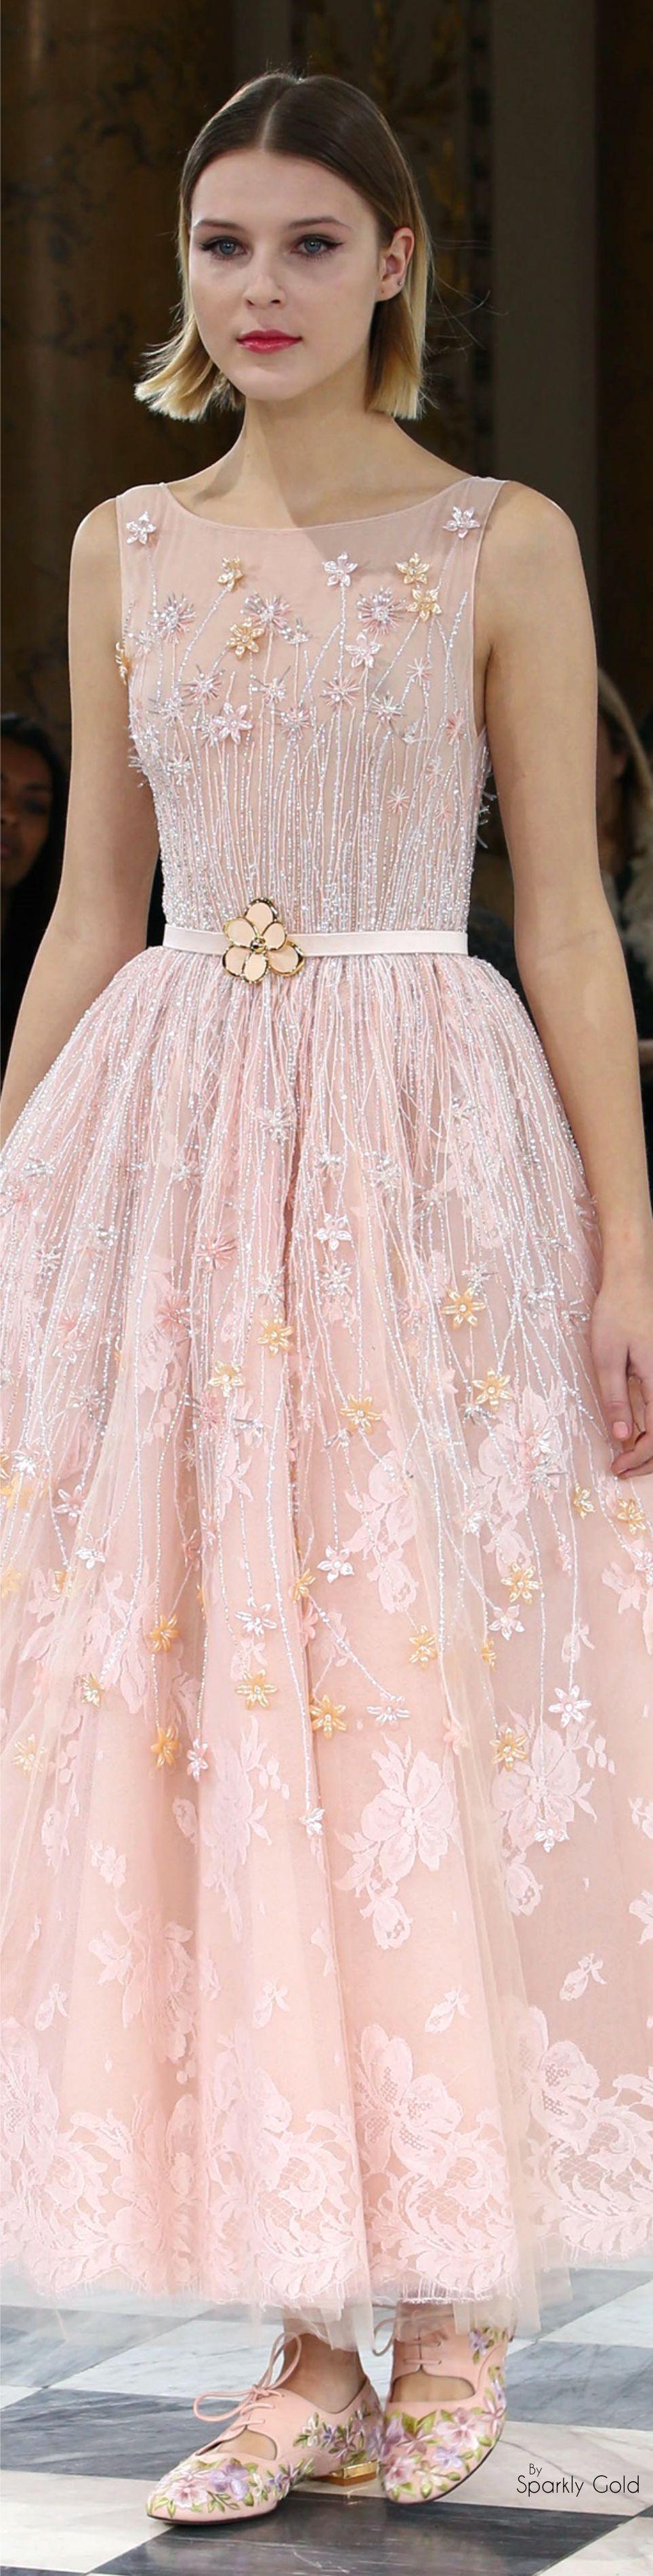 Pin de Julie en Gowns! Glamorous Gowns | Pinterest | Comprar y Coser